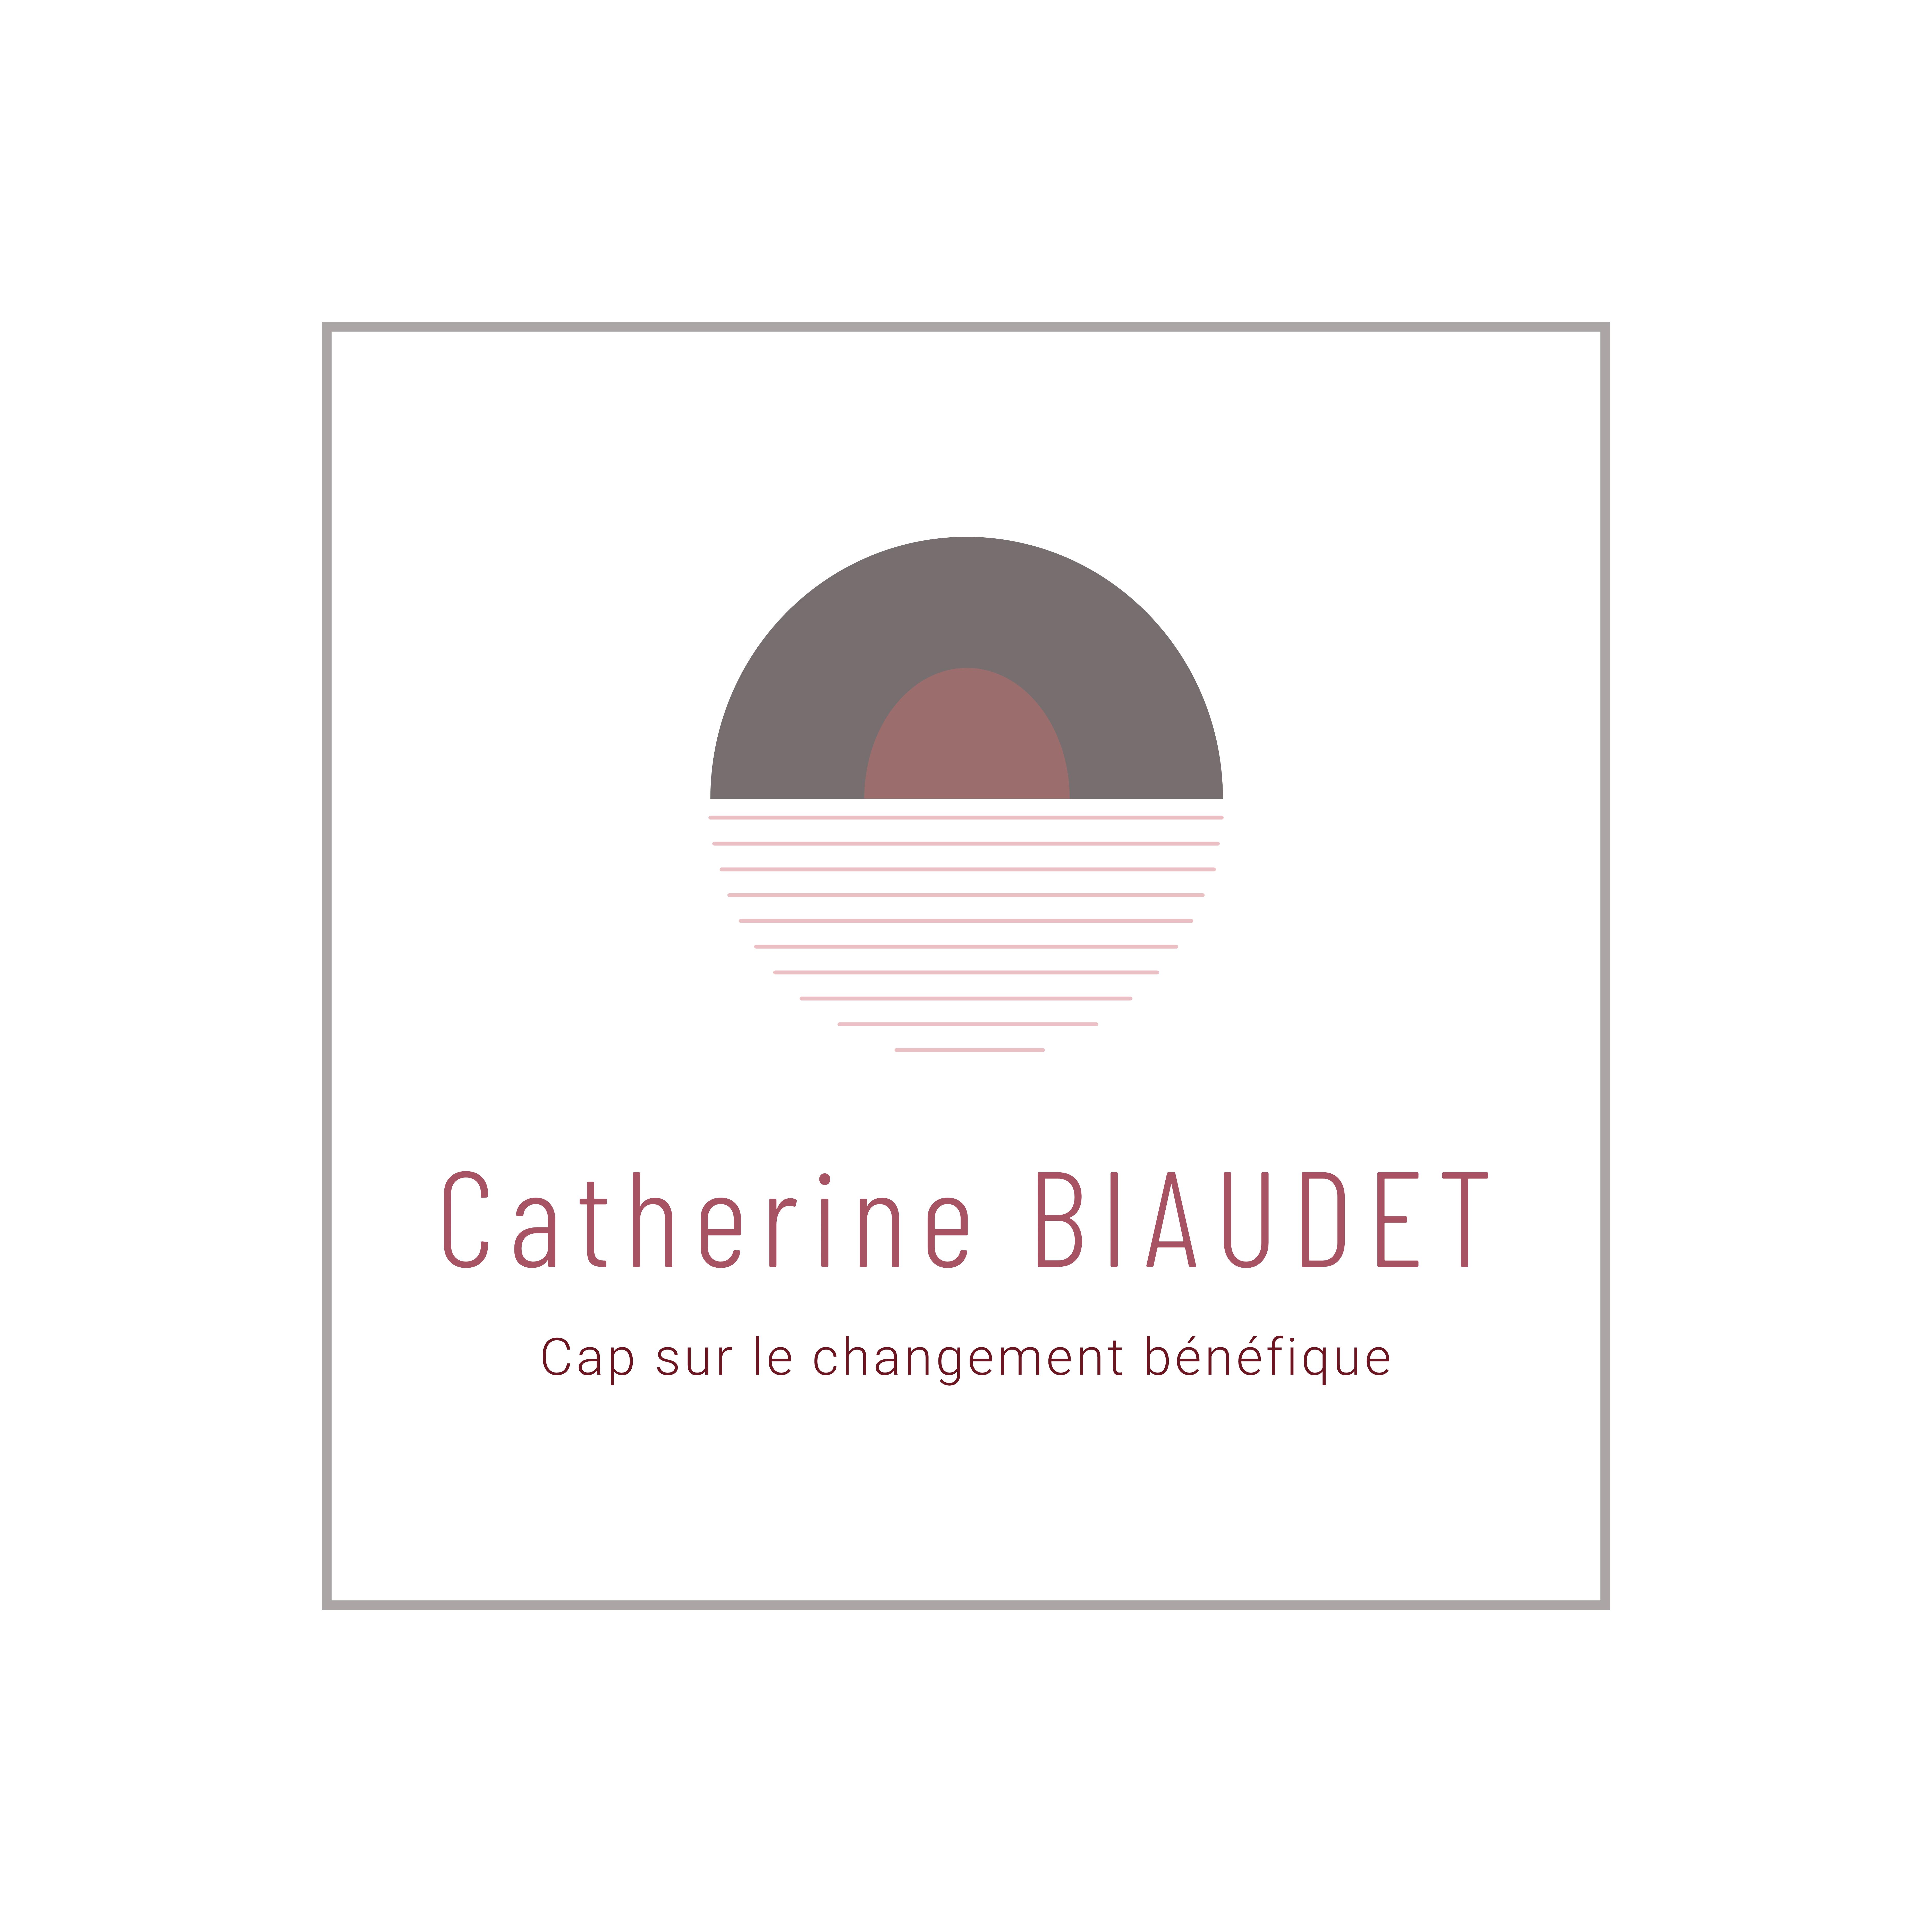 BIAUDET CATHERINE